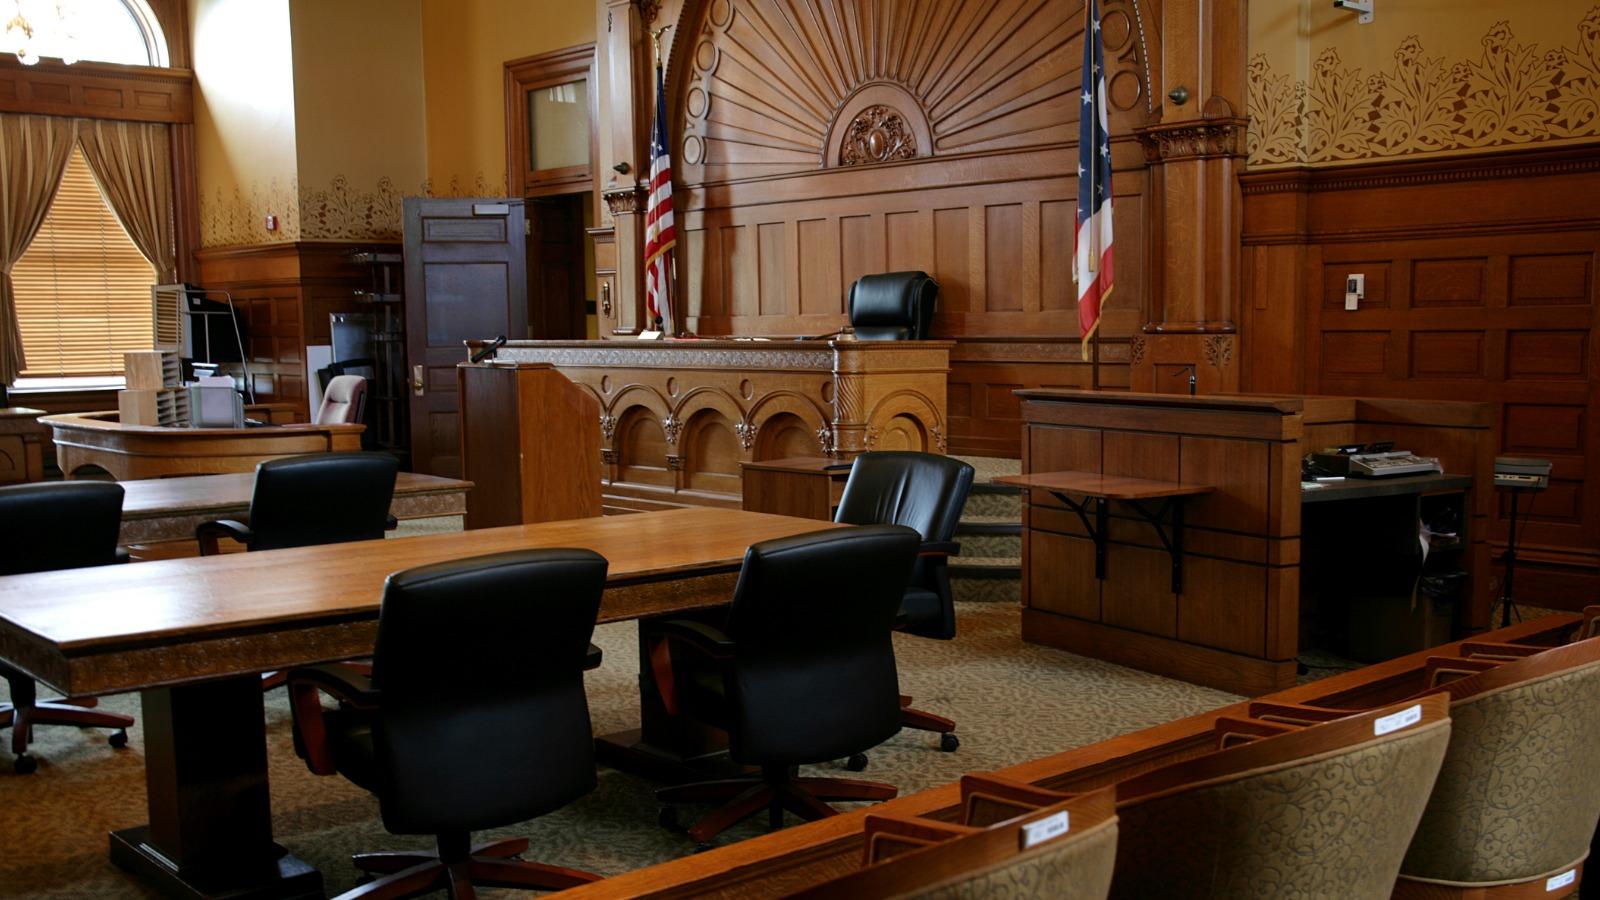 bettsllc litigation commercial litigation - 1600 x 900 px.jpg